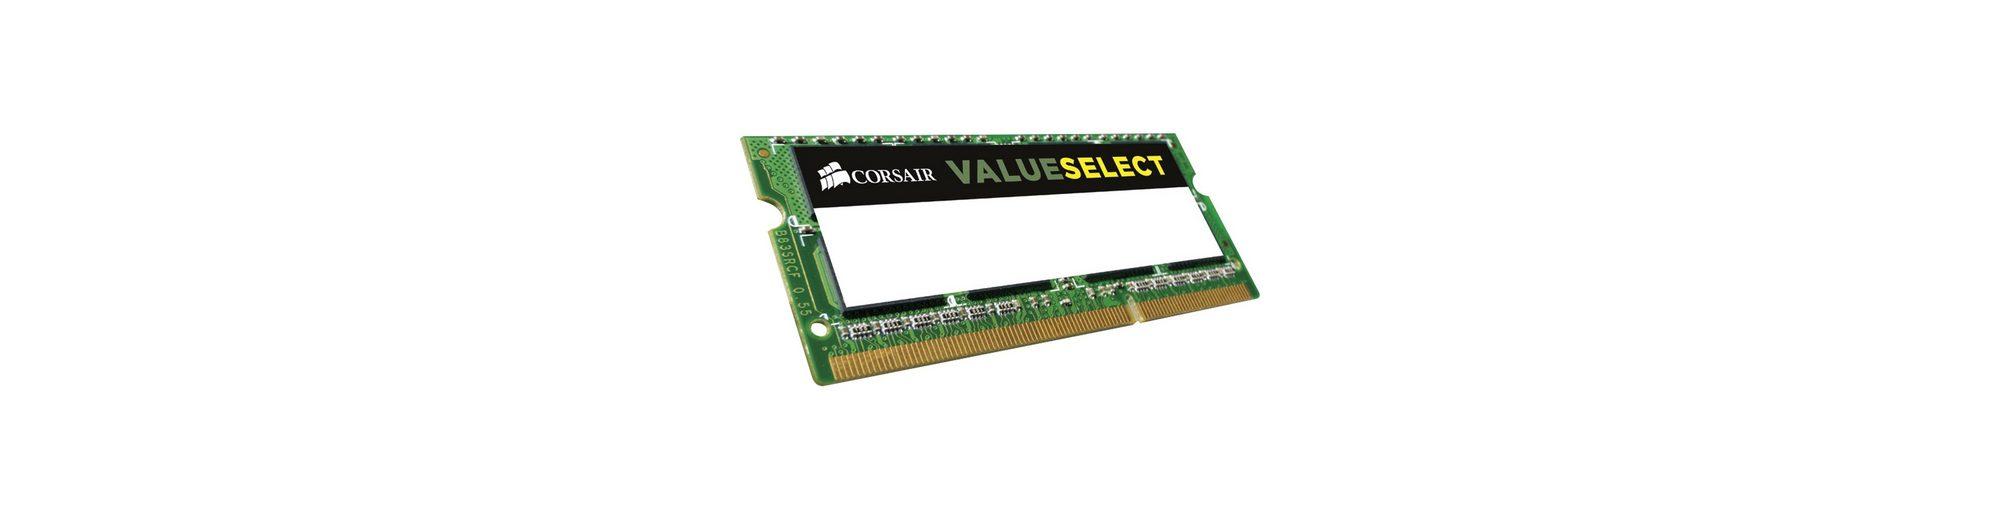 Corsair ValueSelect Arbeitsspeicher »SO-DIMM 2GB DDR3-1600«